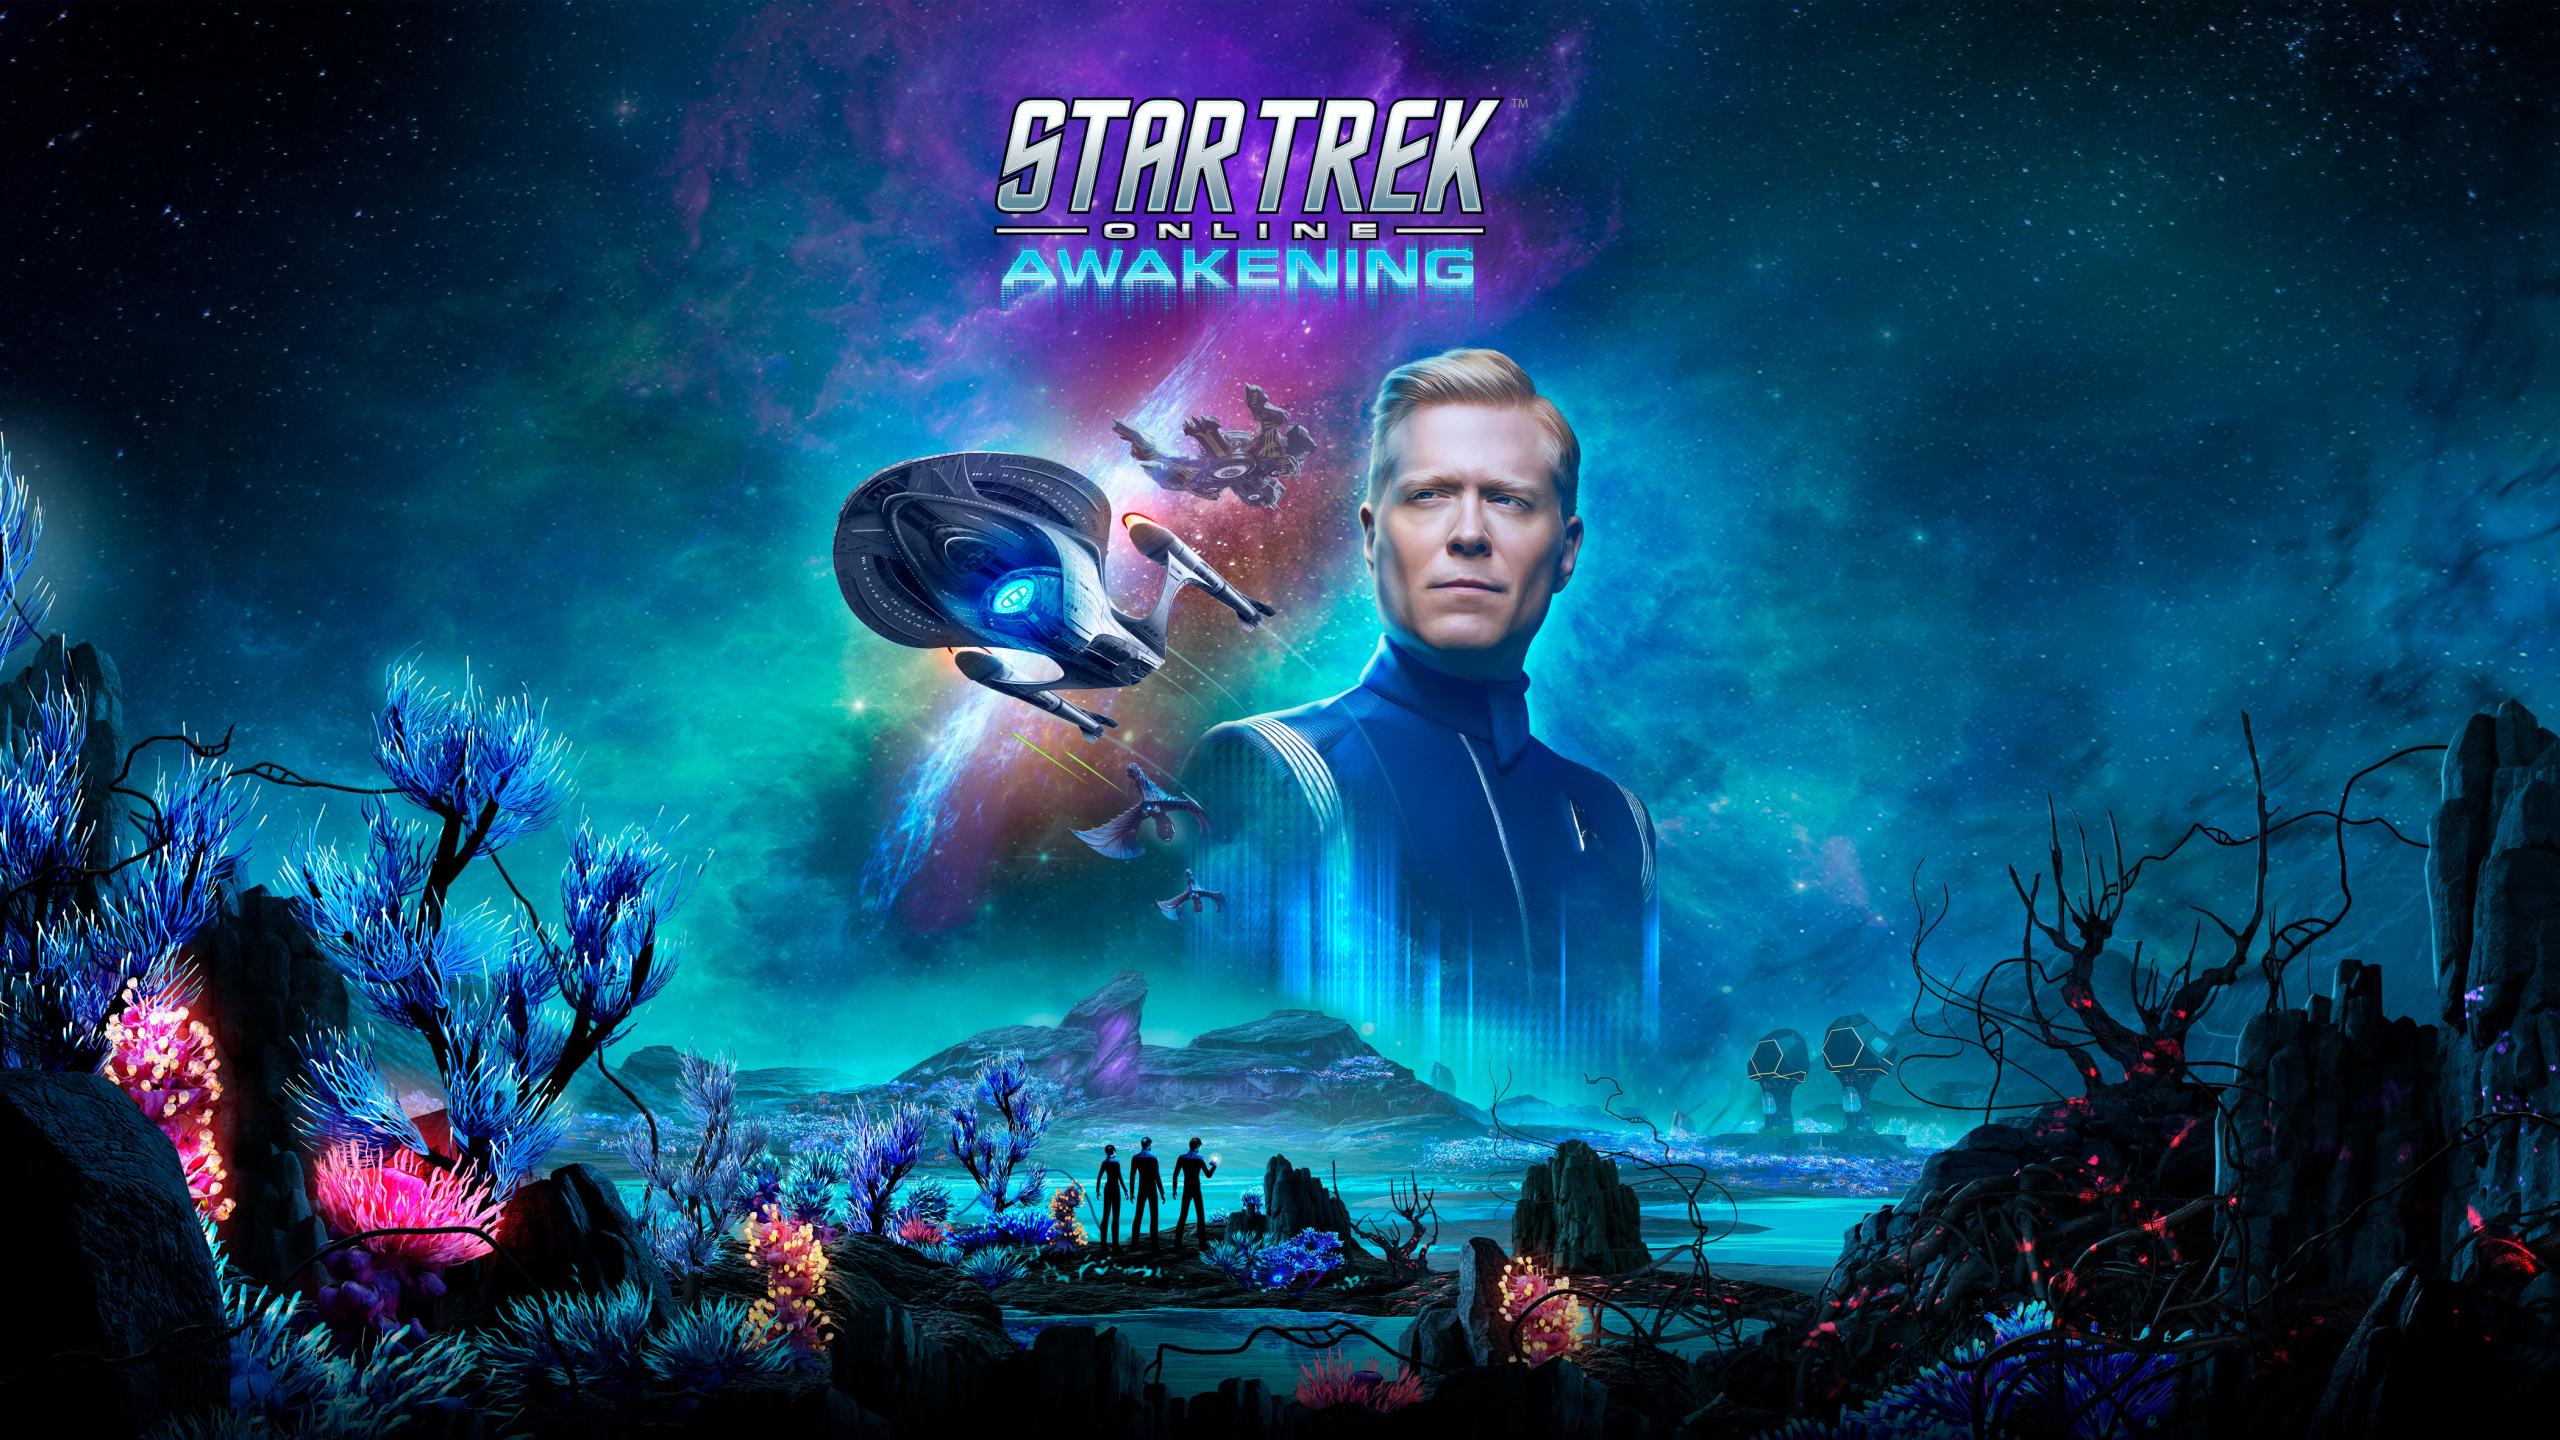 2560x1440 Star Trek Online 2019 1440P Resolution Wallpaper ...